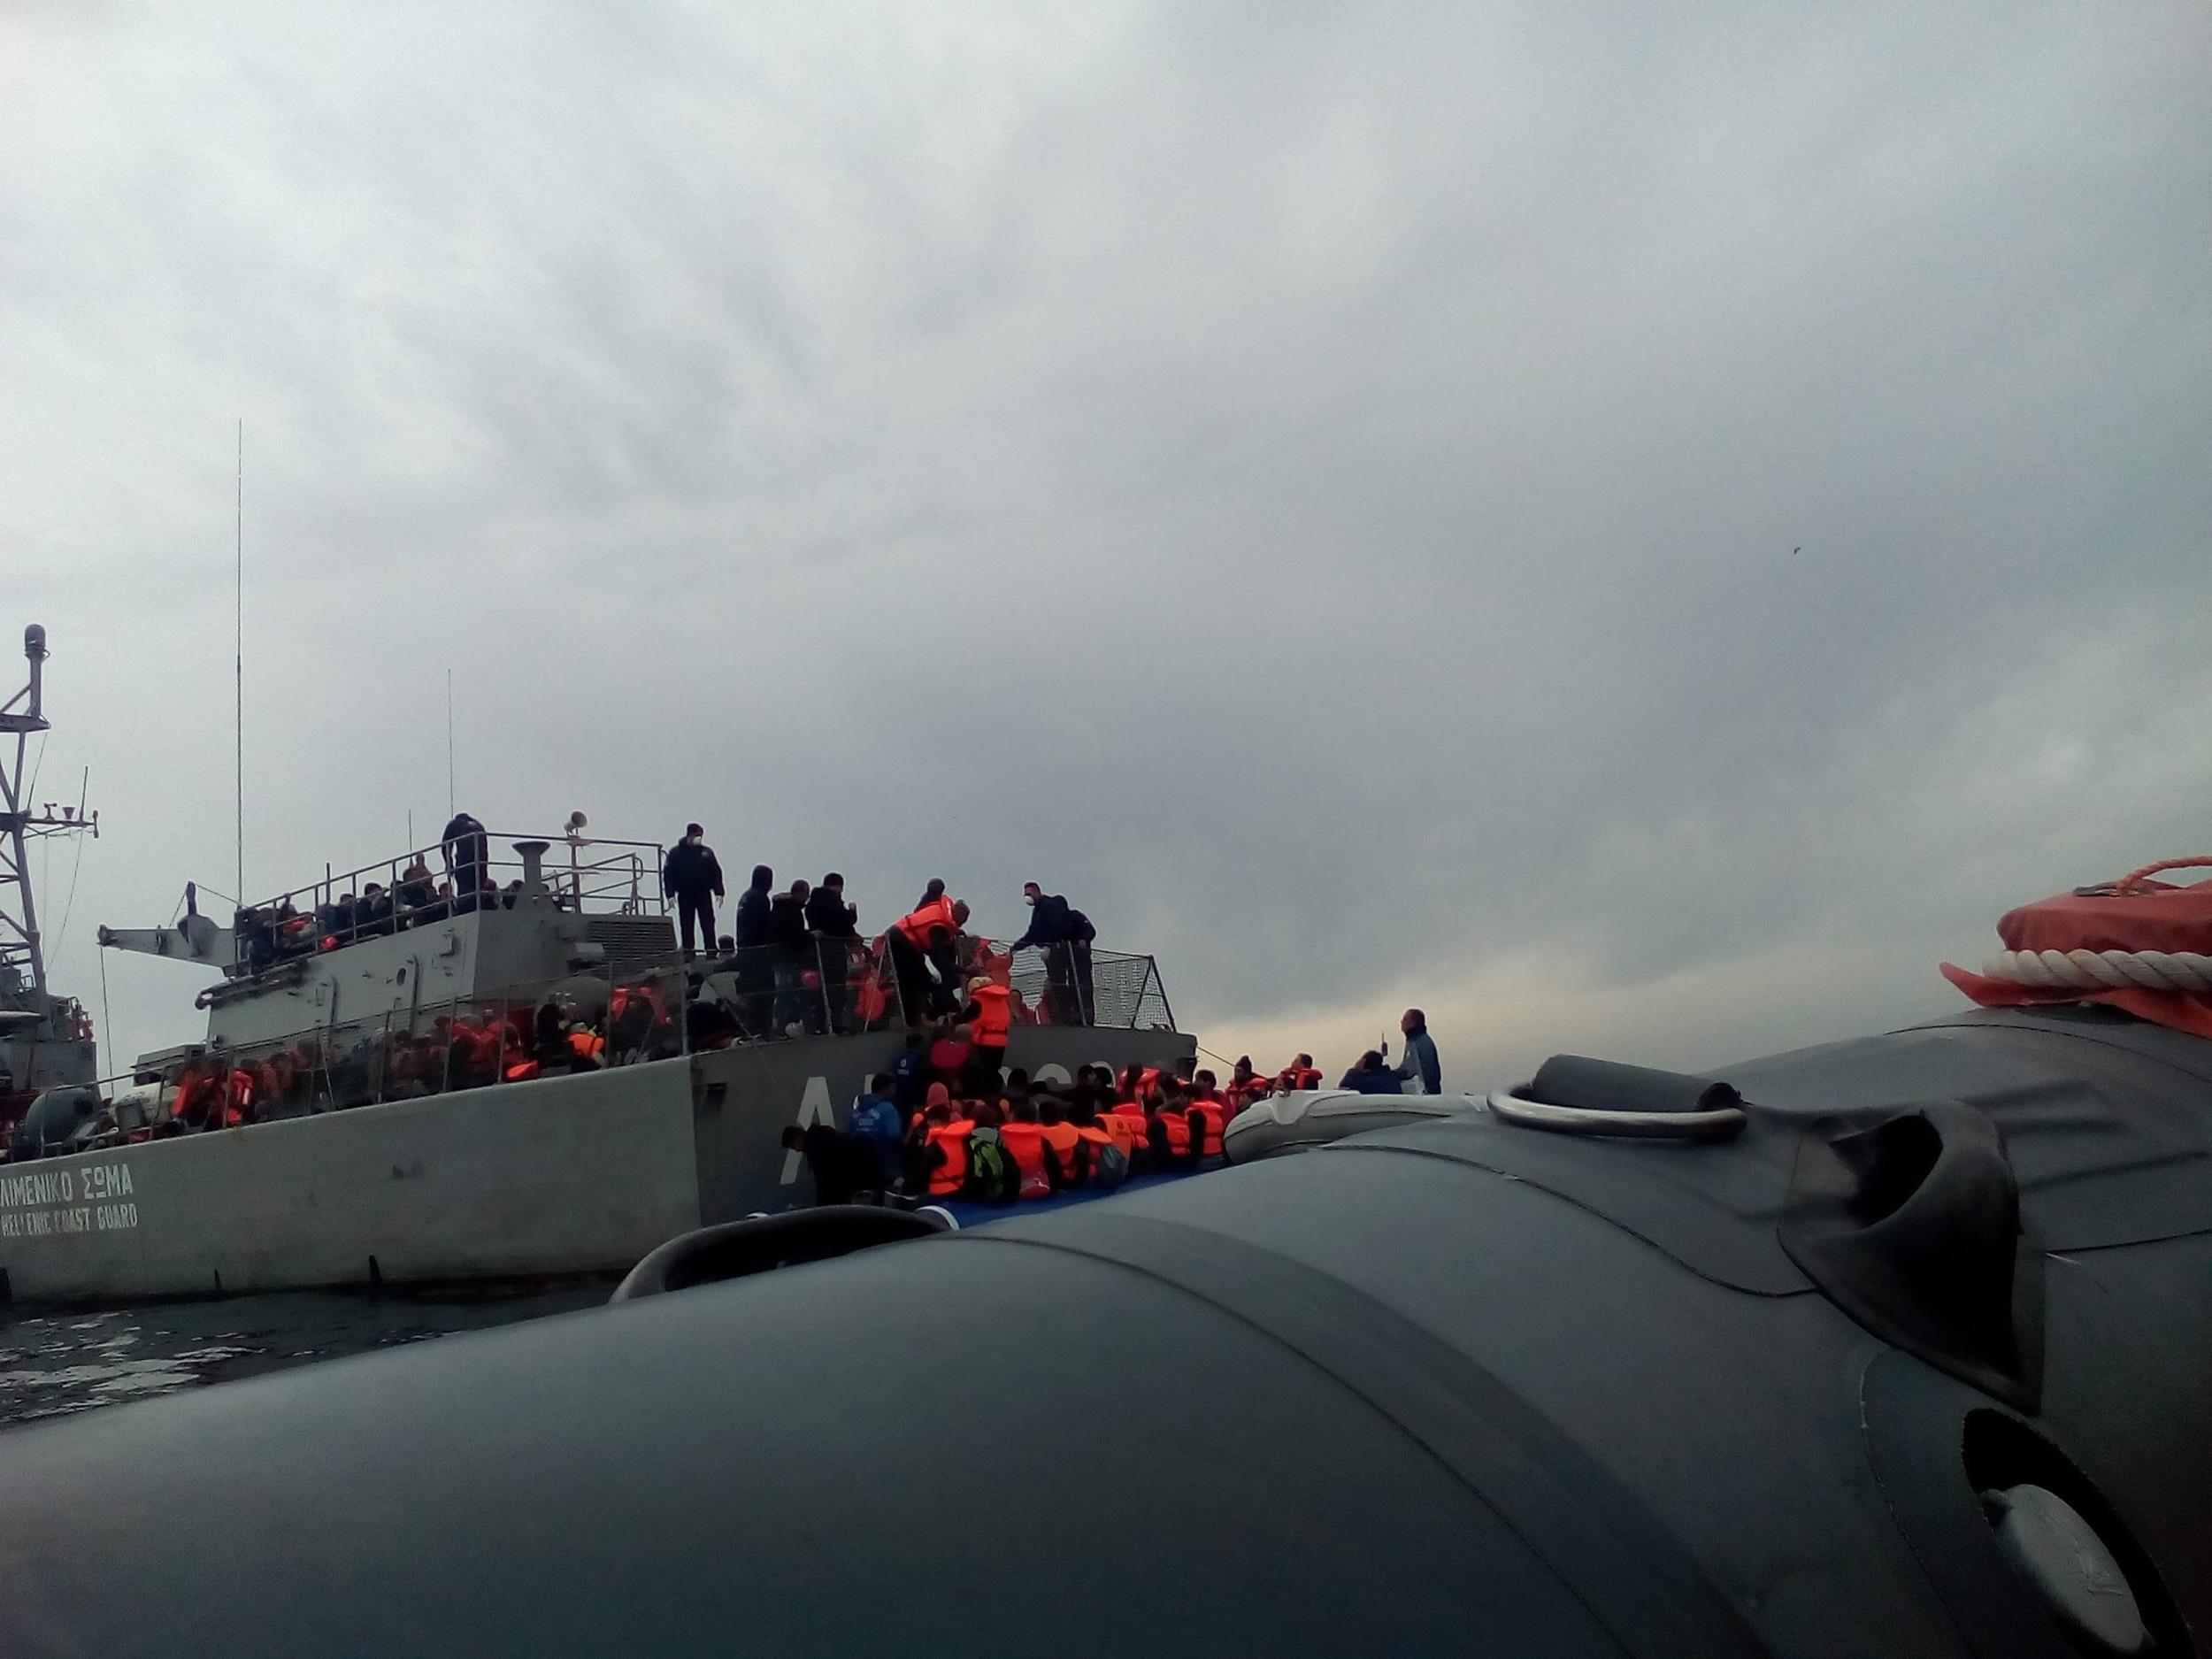 coastguard loading.jpg